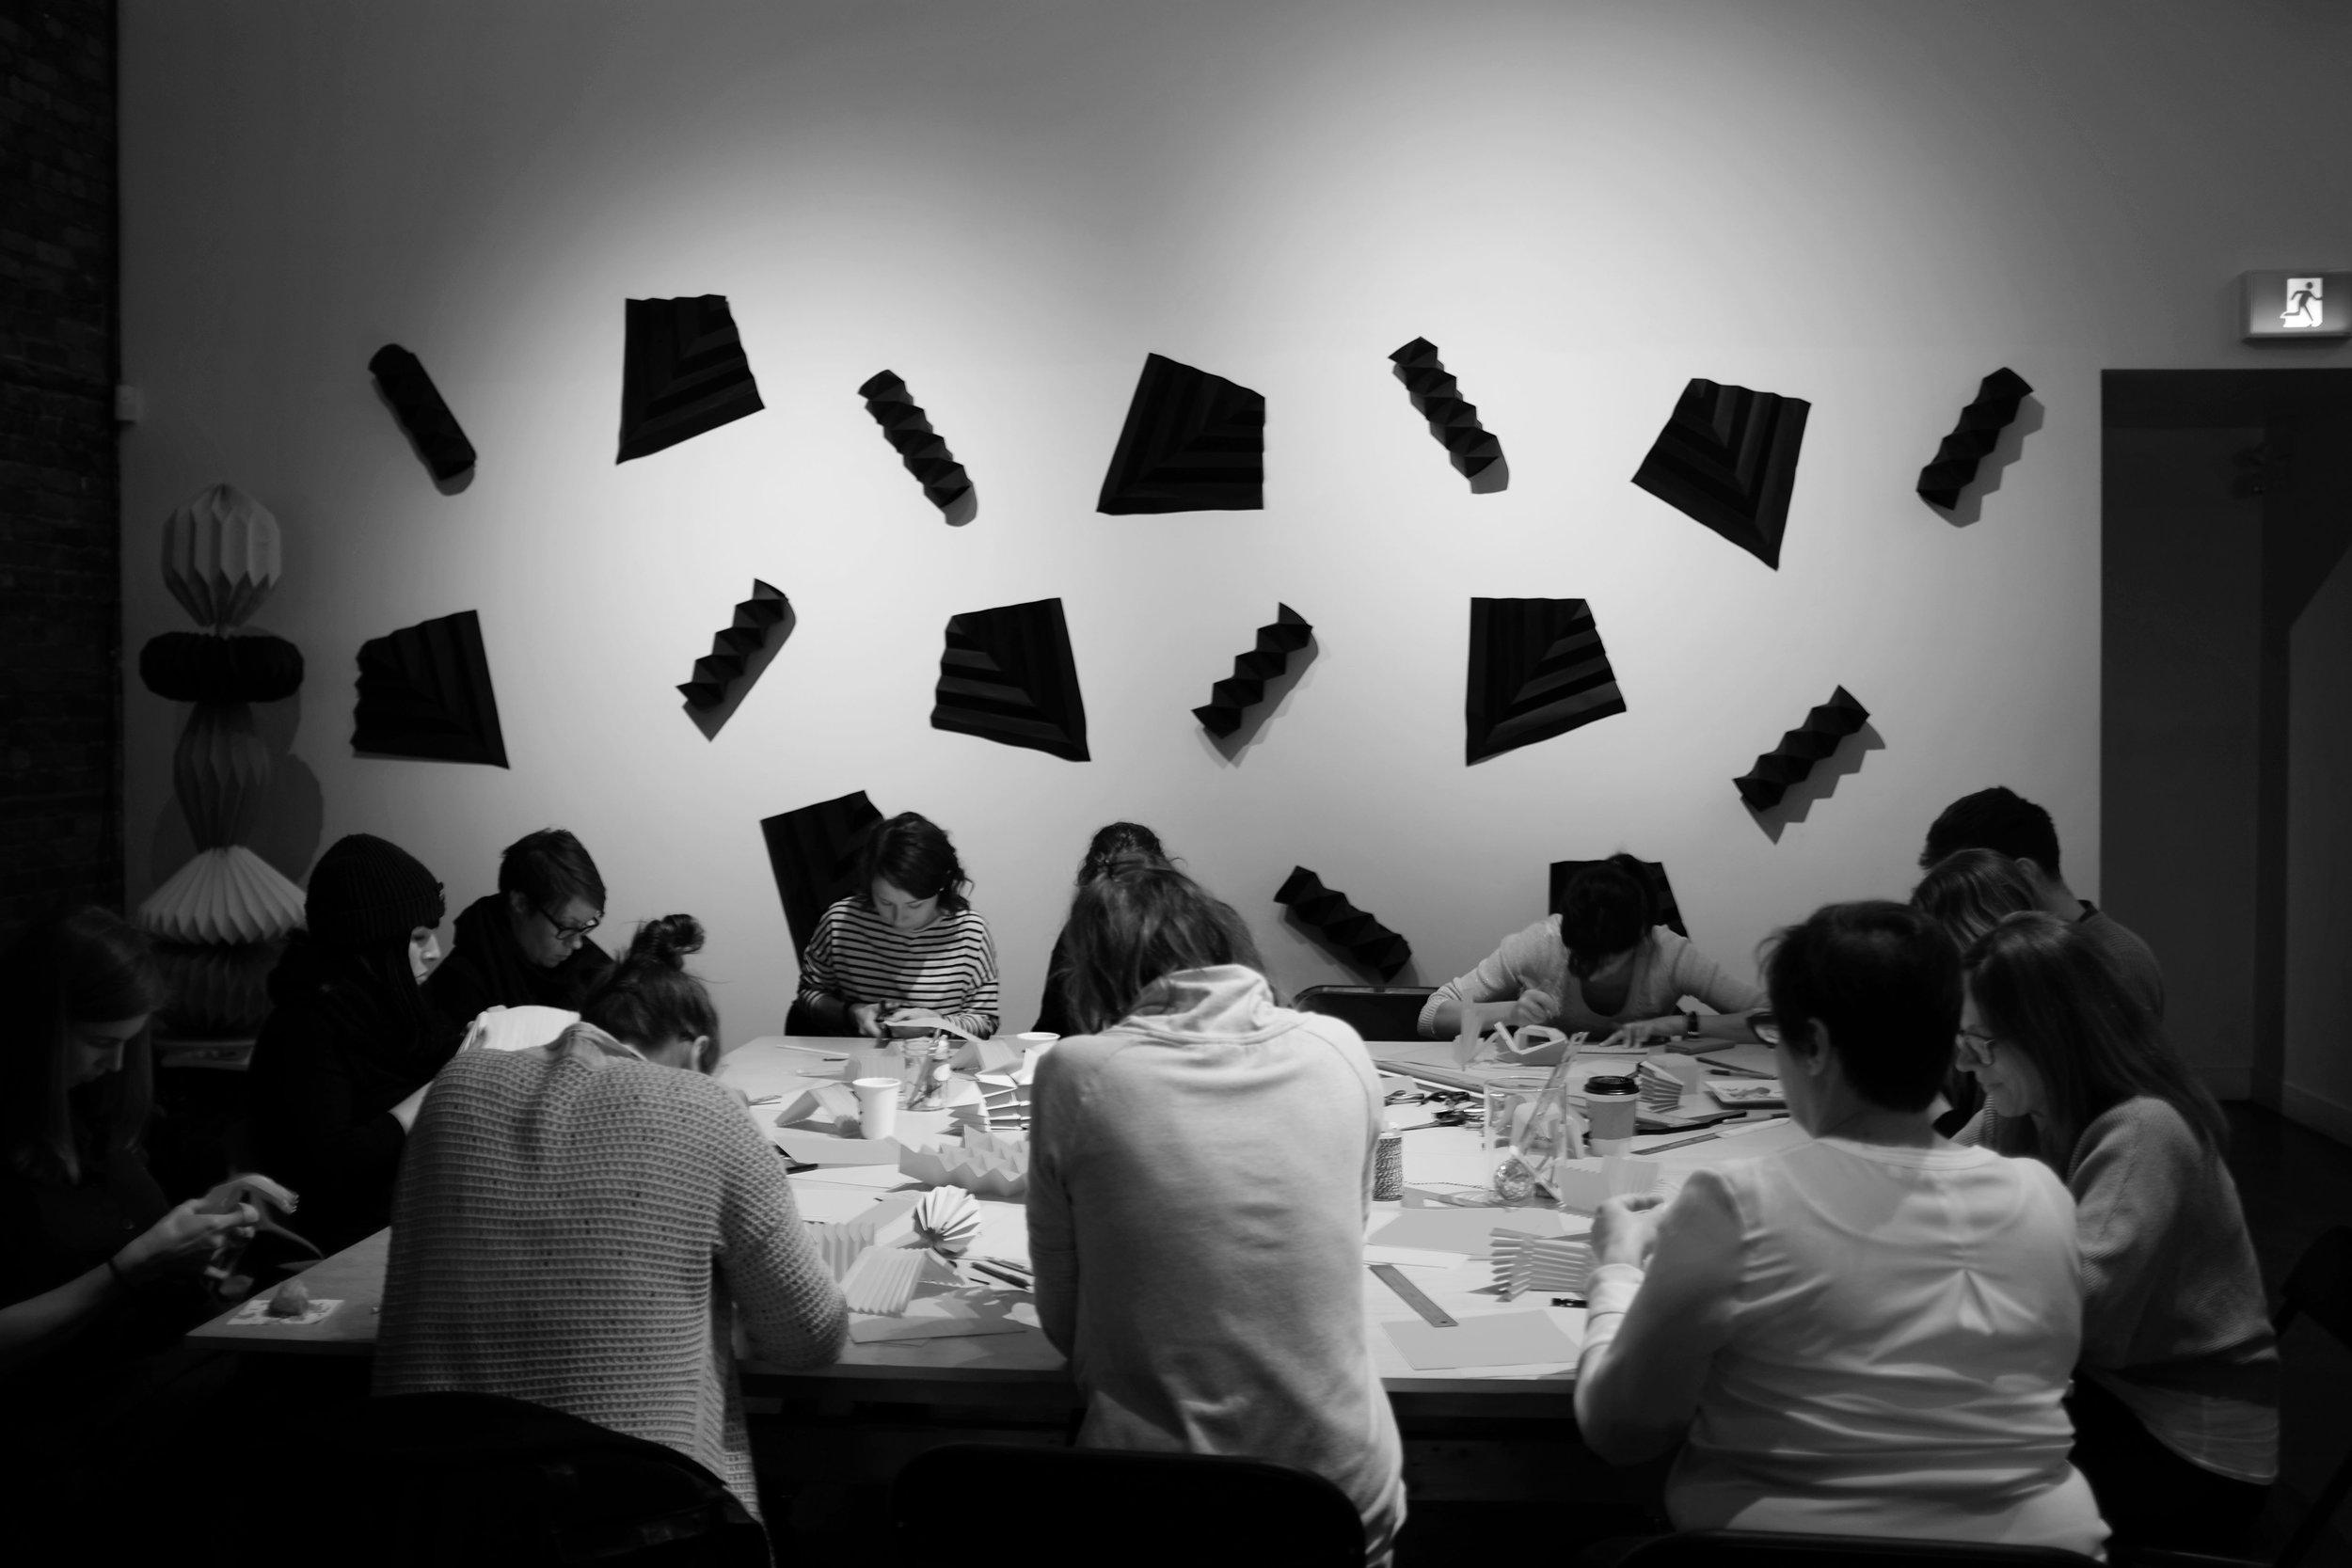 miss-cloudy-folding-light-22-avril-origami-atelier-workshop-4.jpg